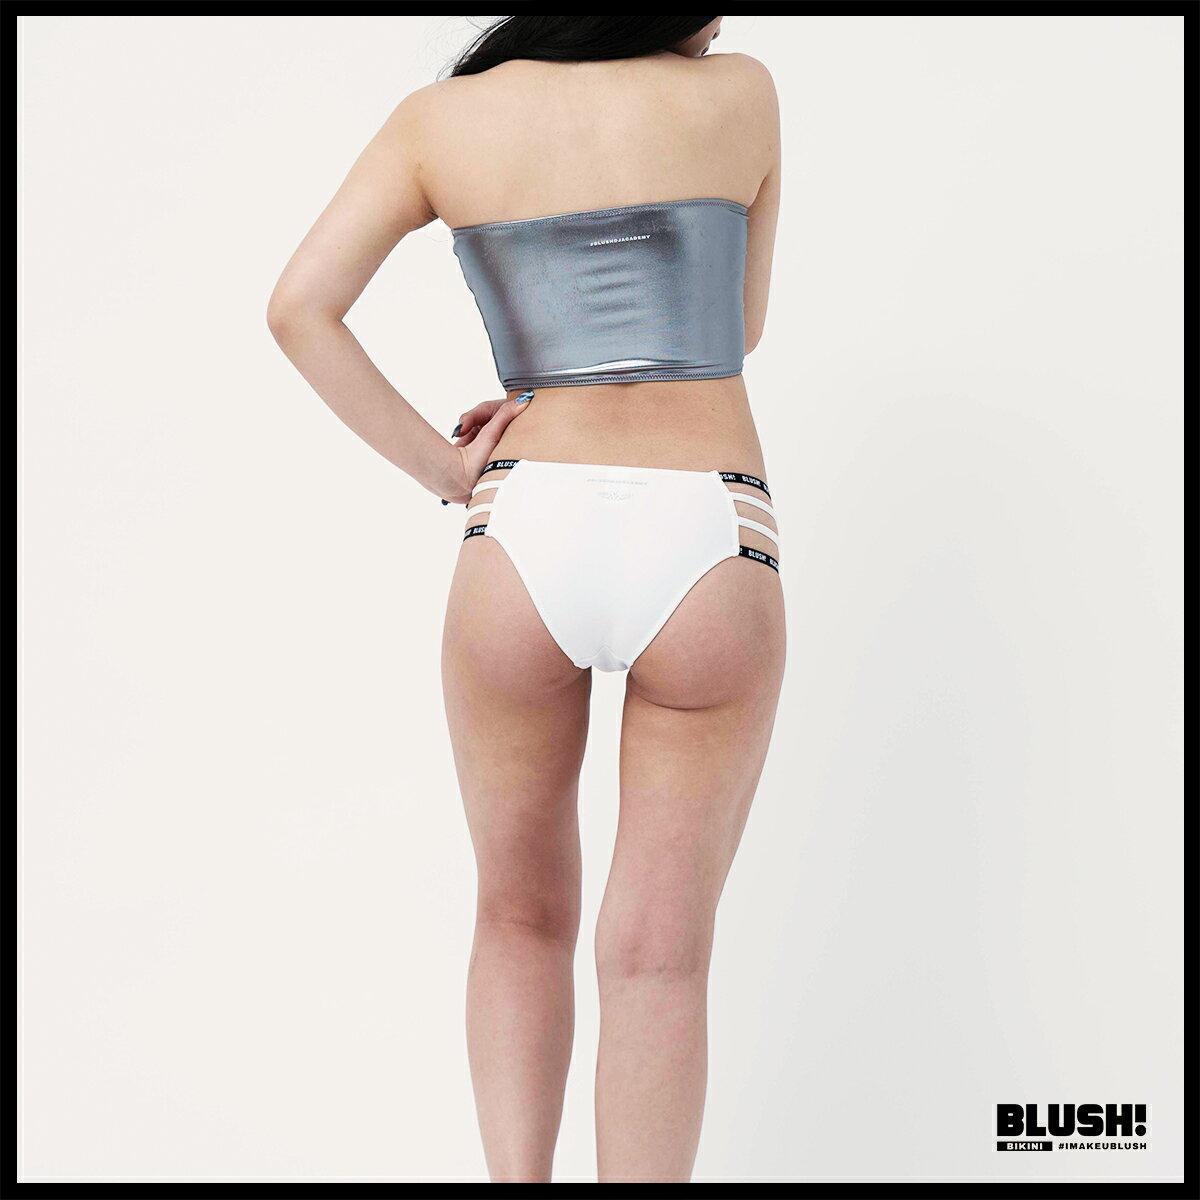 BLUSH! 平口小可愛 - 銀色